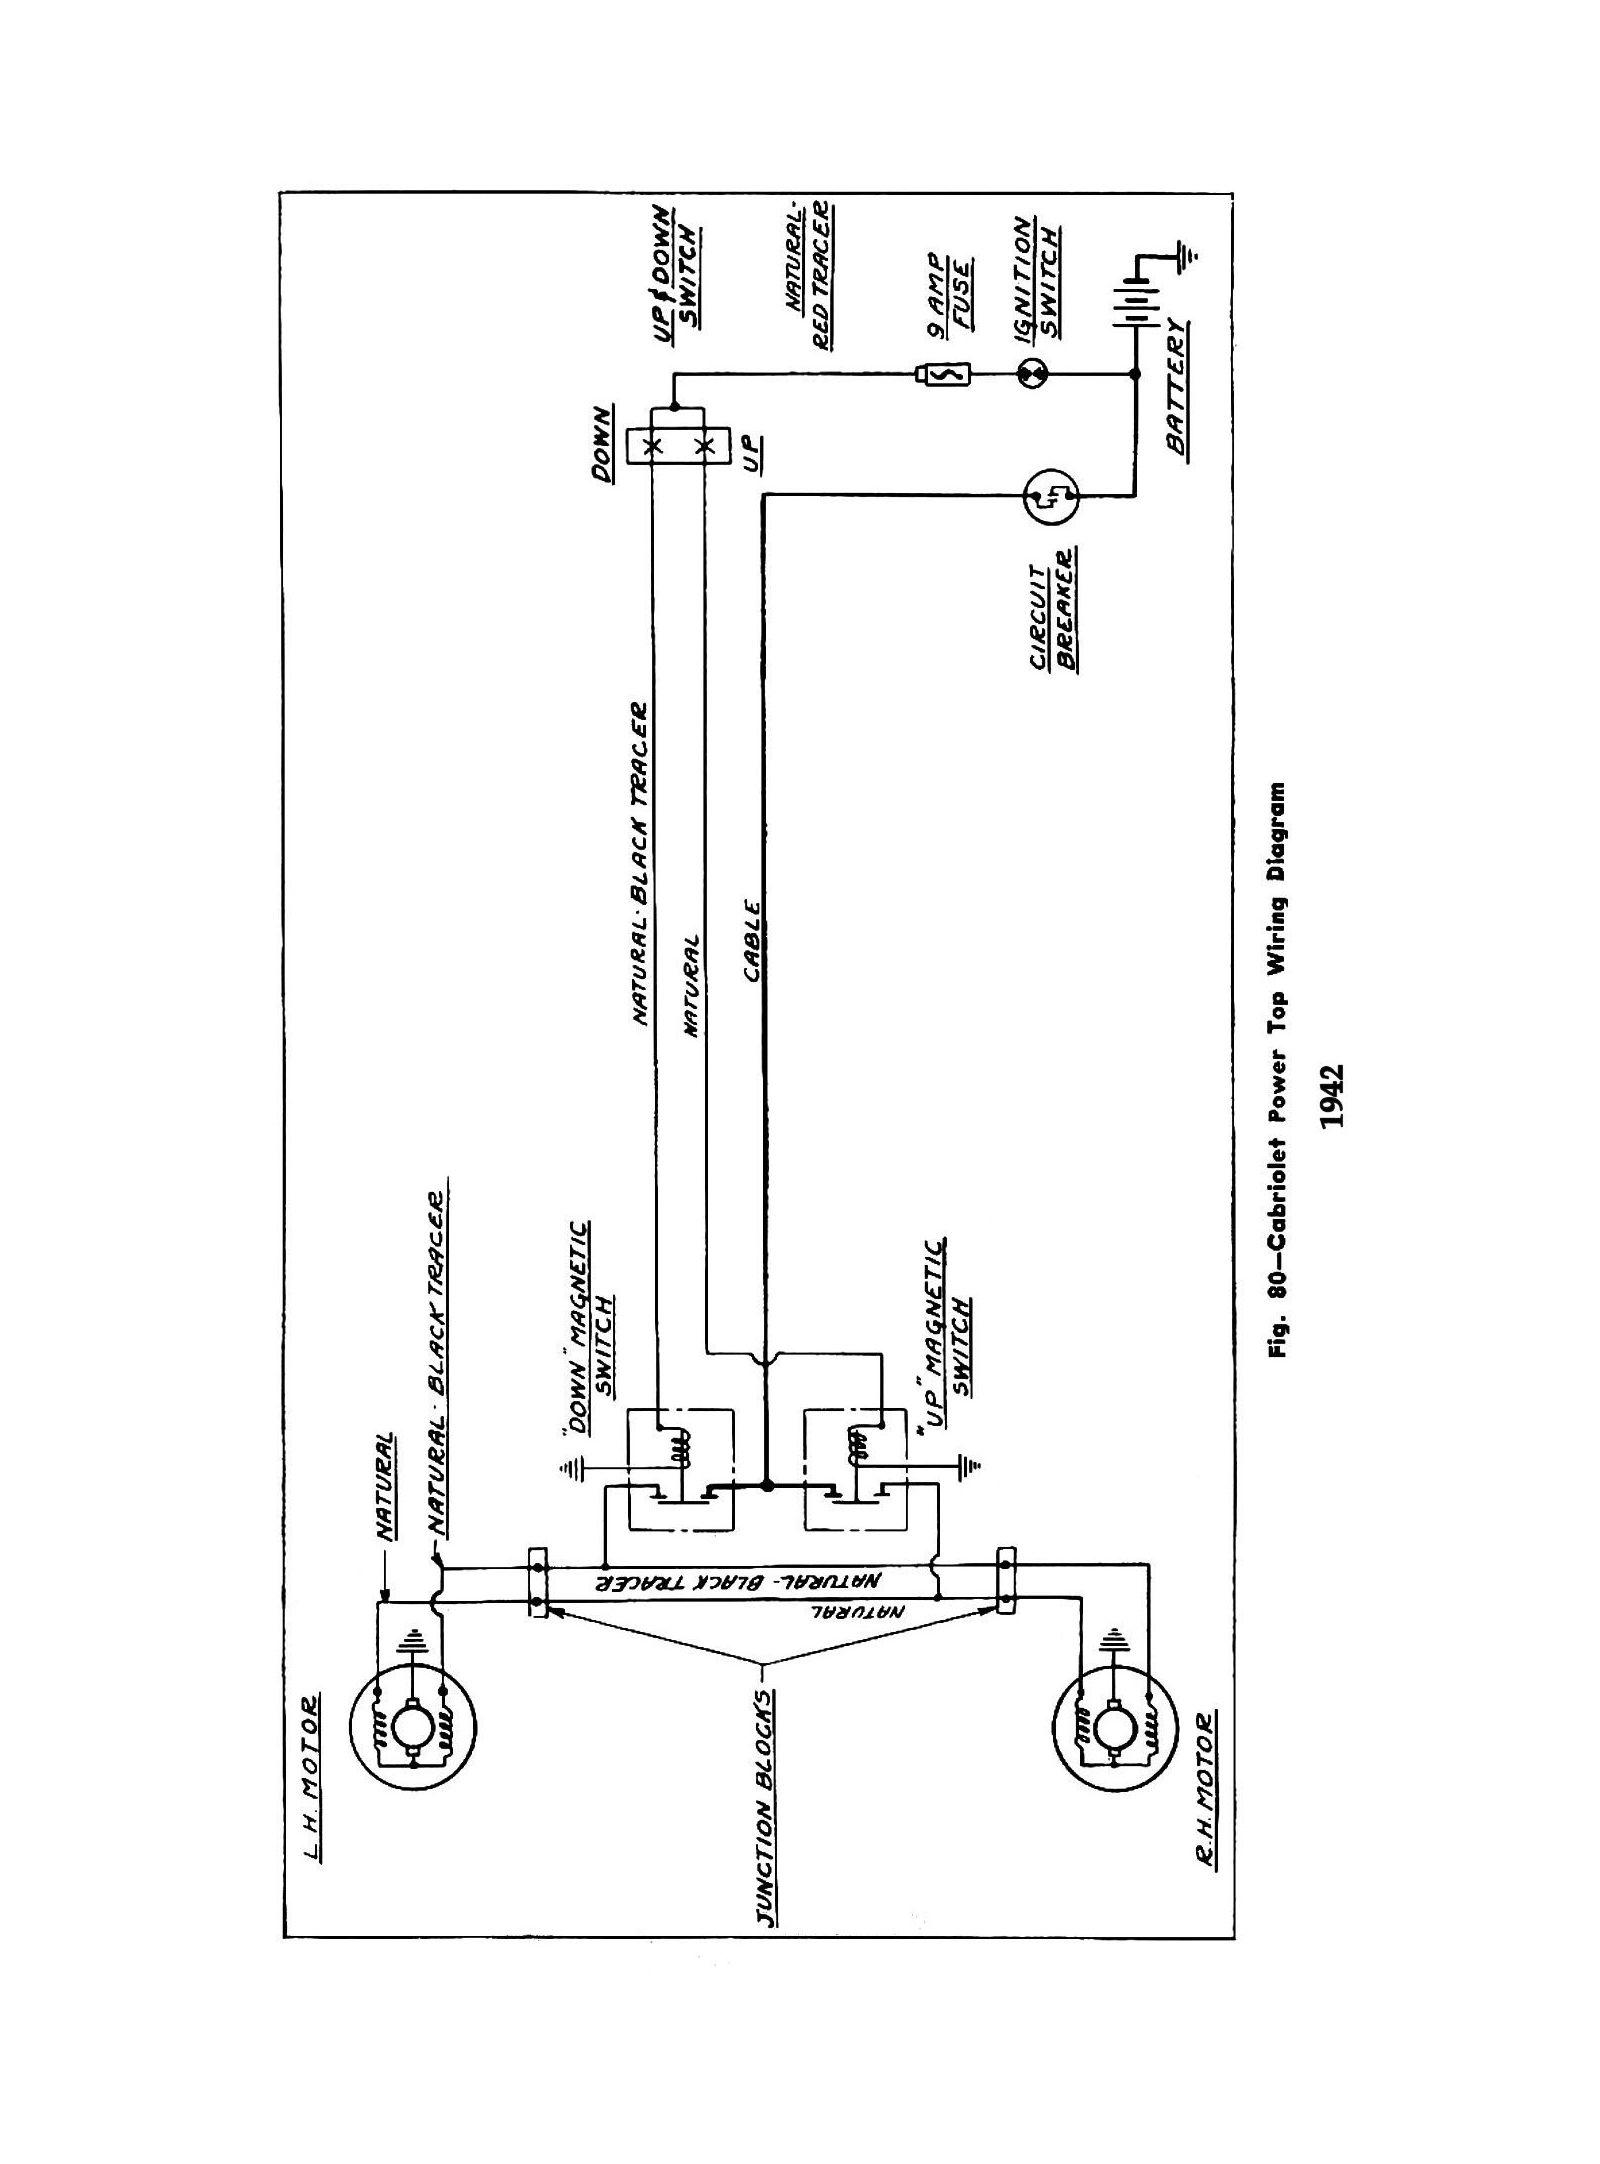 1940 chev car audio wiring diagrams